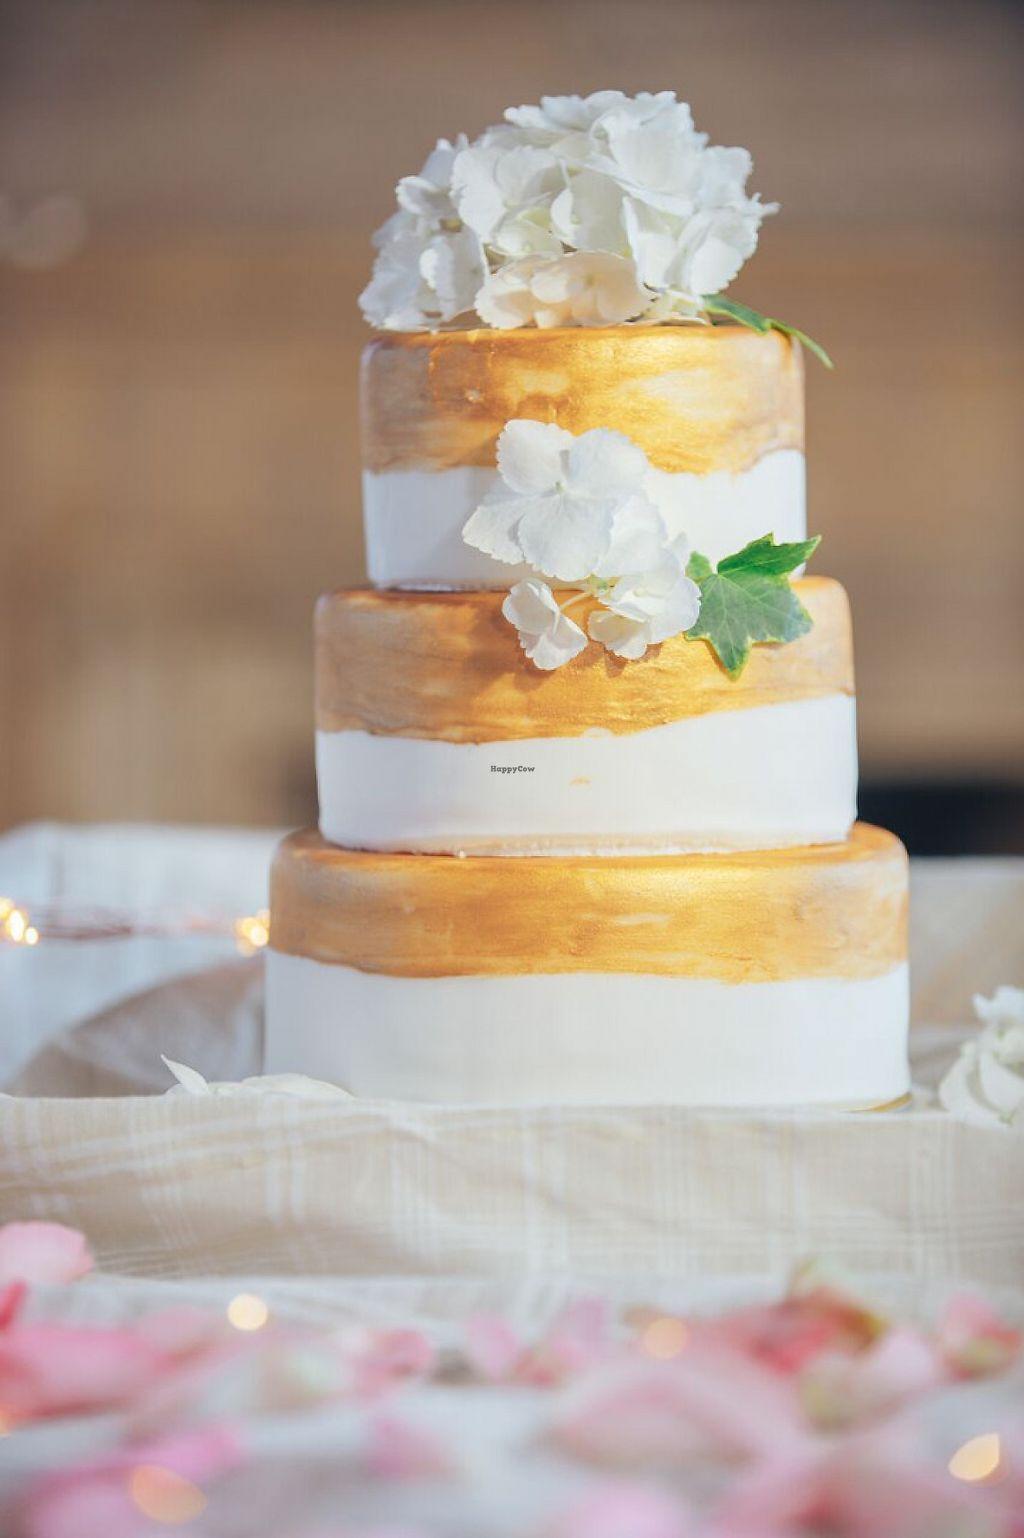 "Photo of Crystal Fairytale Events  by <a href=""/members/profile/KrystallinaParamythi"">KrystallinaParamythi</a> <br/>Wedding cake <br/> May 30, 2017  - <a href='/contact/abuse/image/93095/264260'>Report</a>"